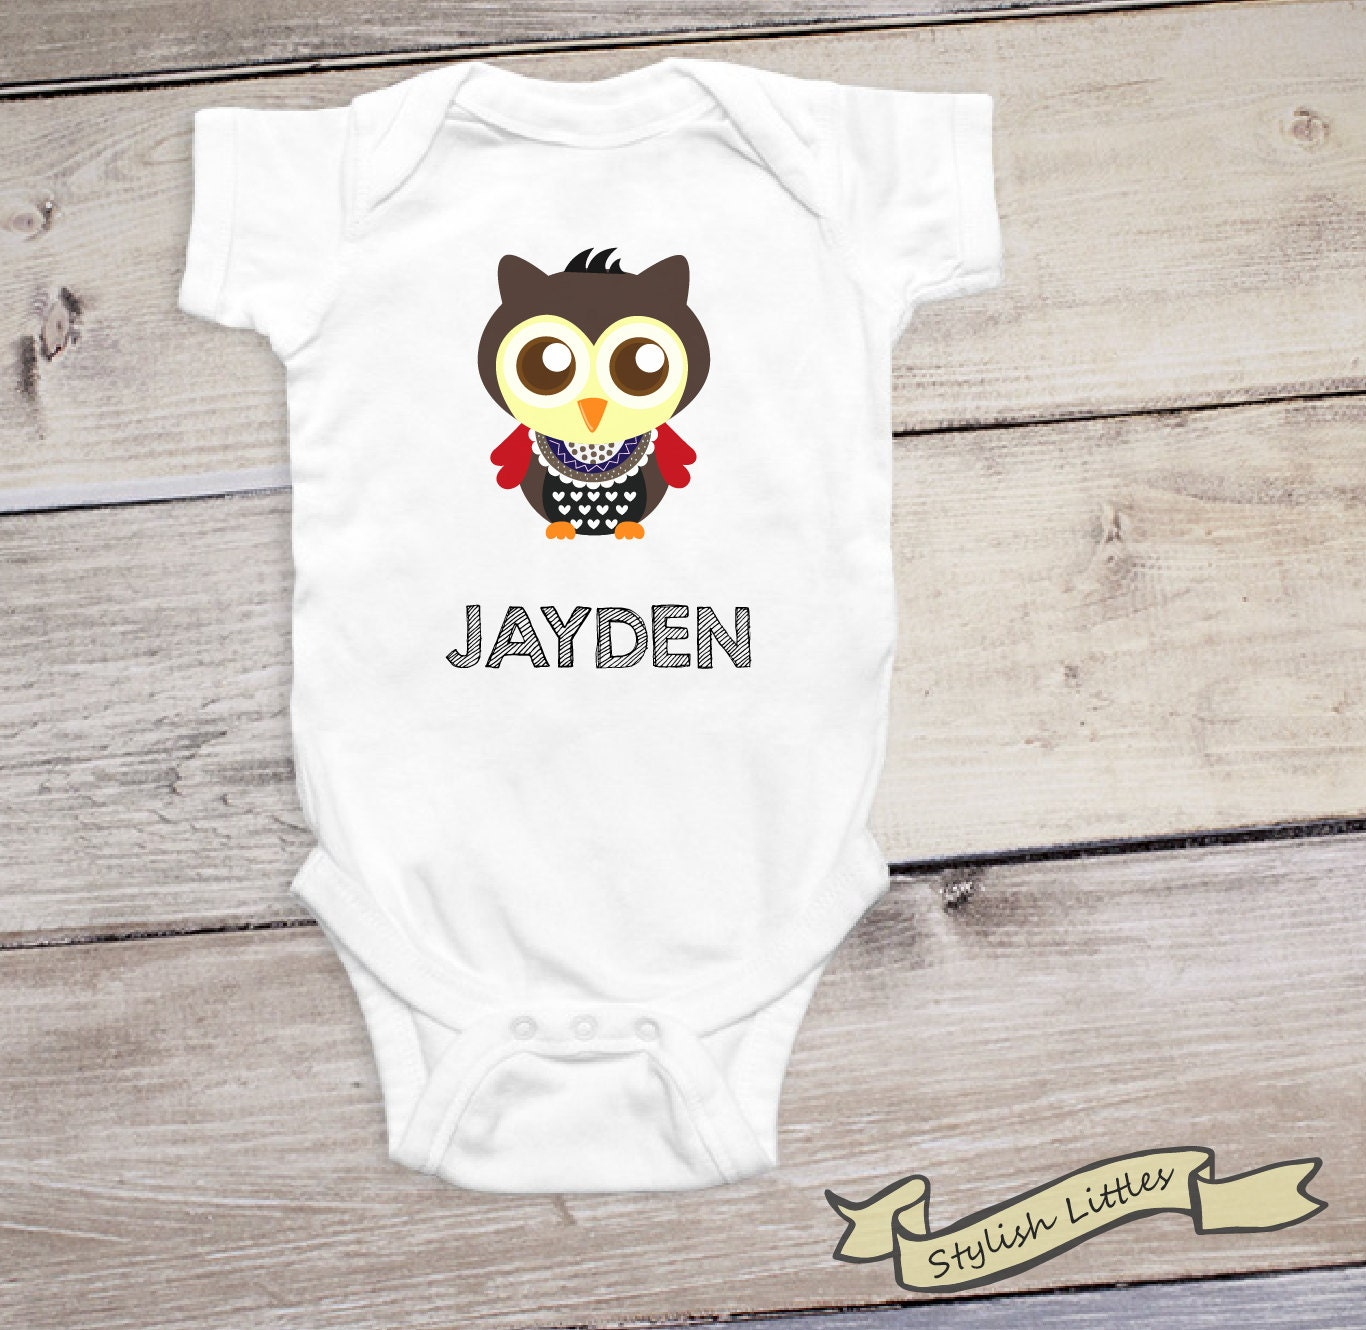 877b5ce63 Personalized Baby Boy Onesie®, Custom Toddler Shirt, Baby Boy ...